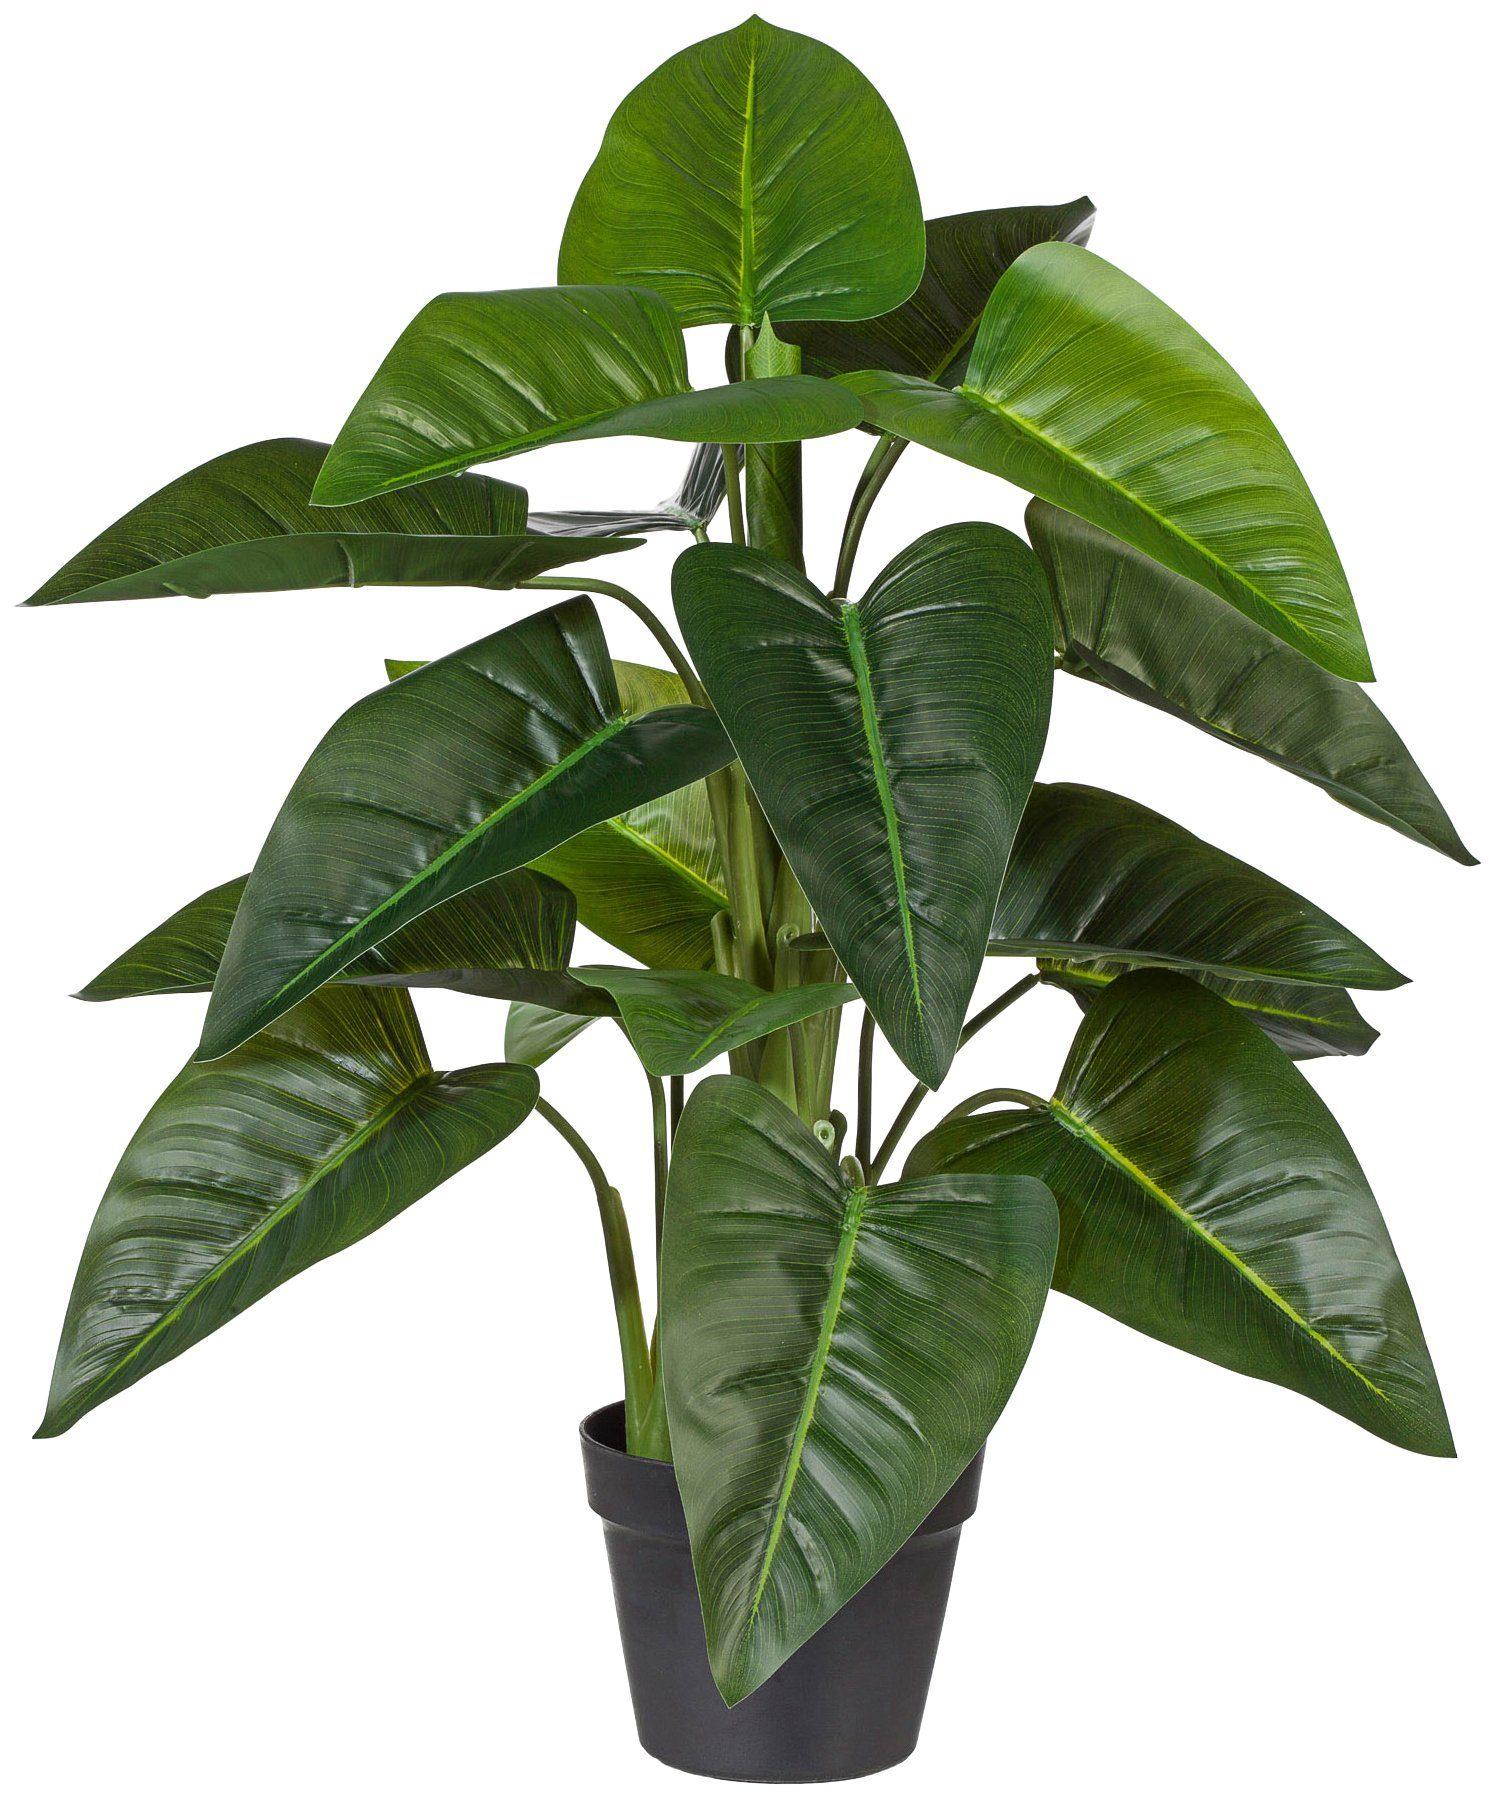 Kunstpflanze »Philodendron«, im Kunststofftopf, H: 75 cm